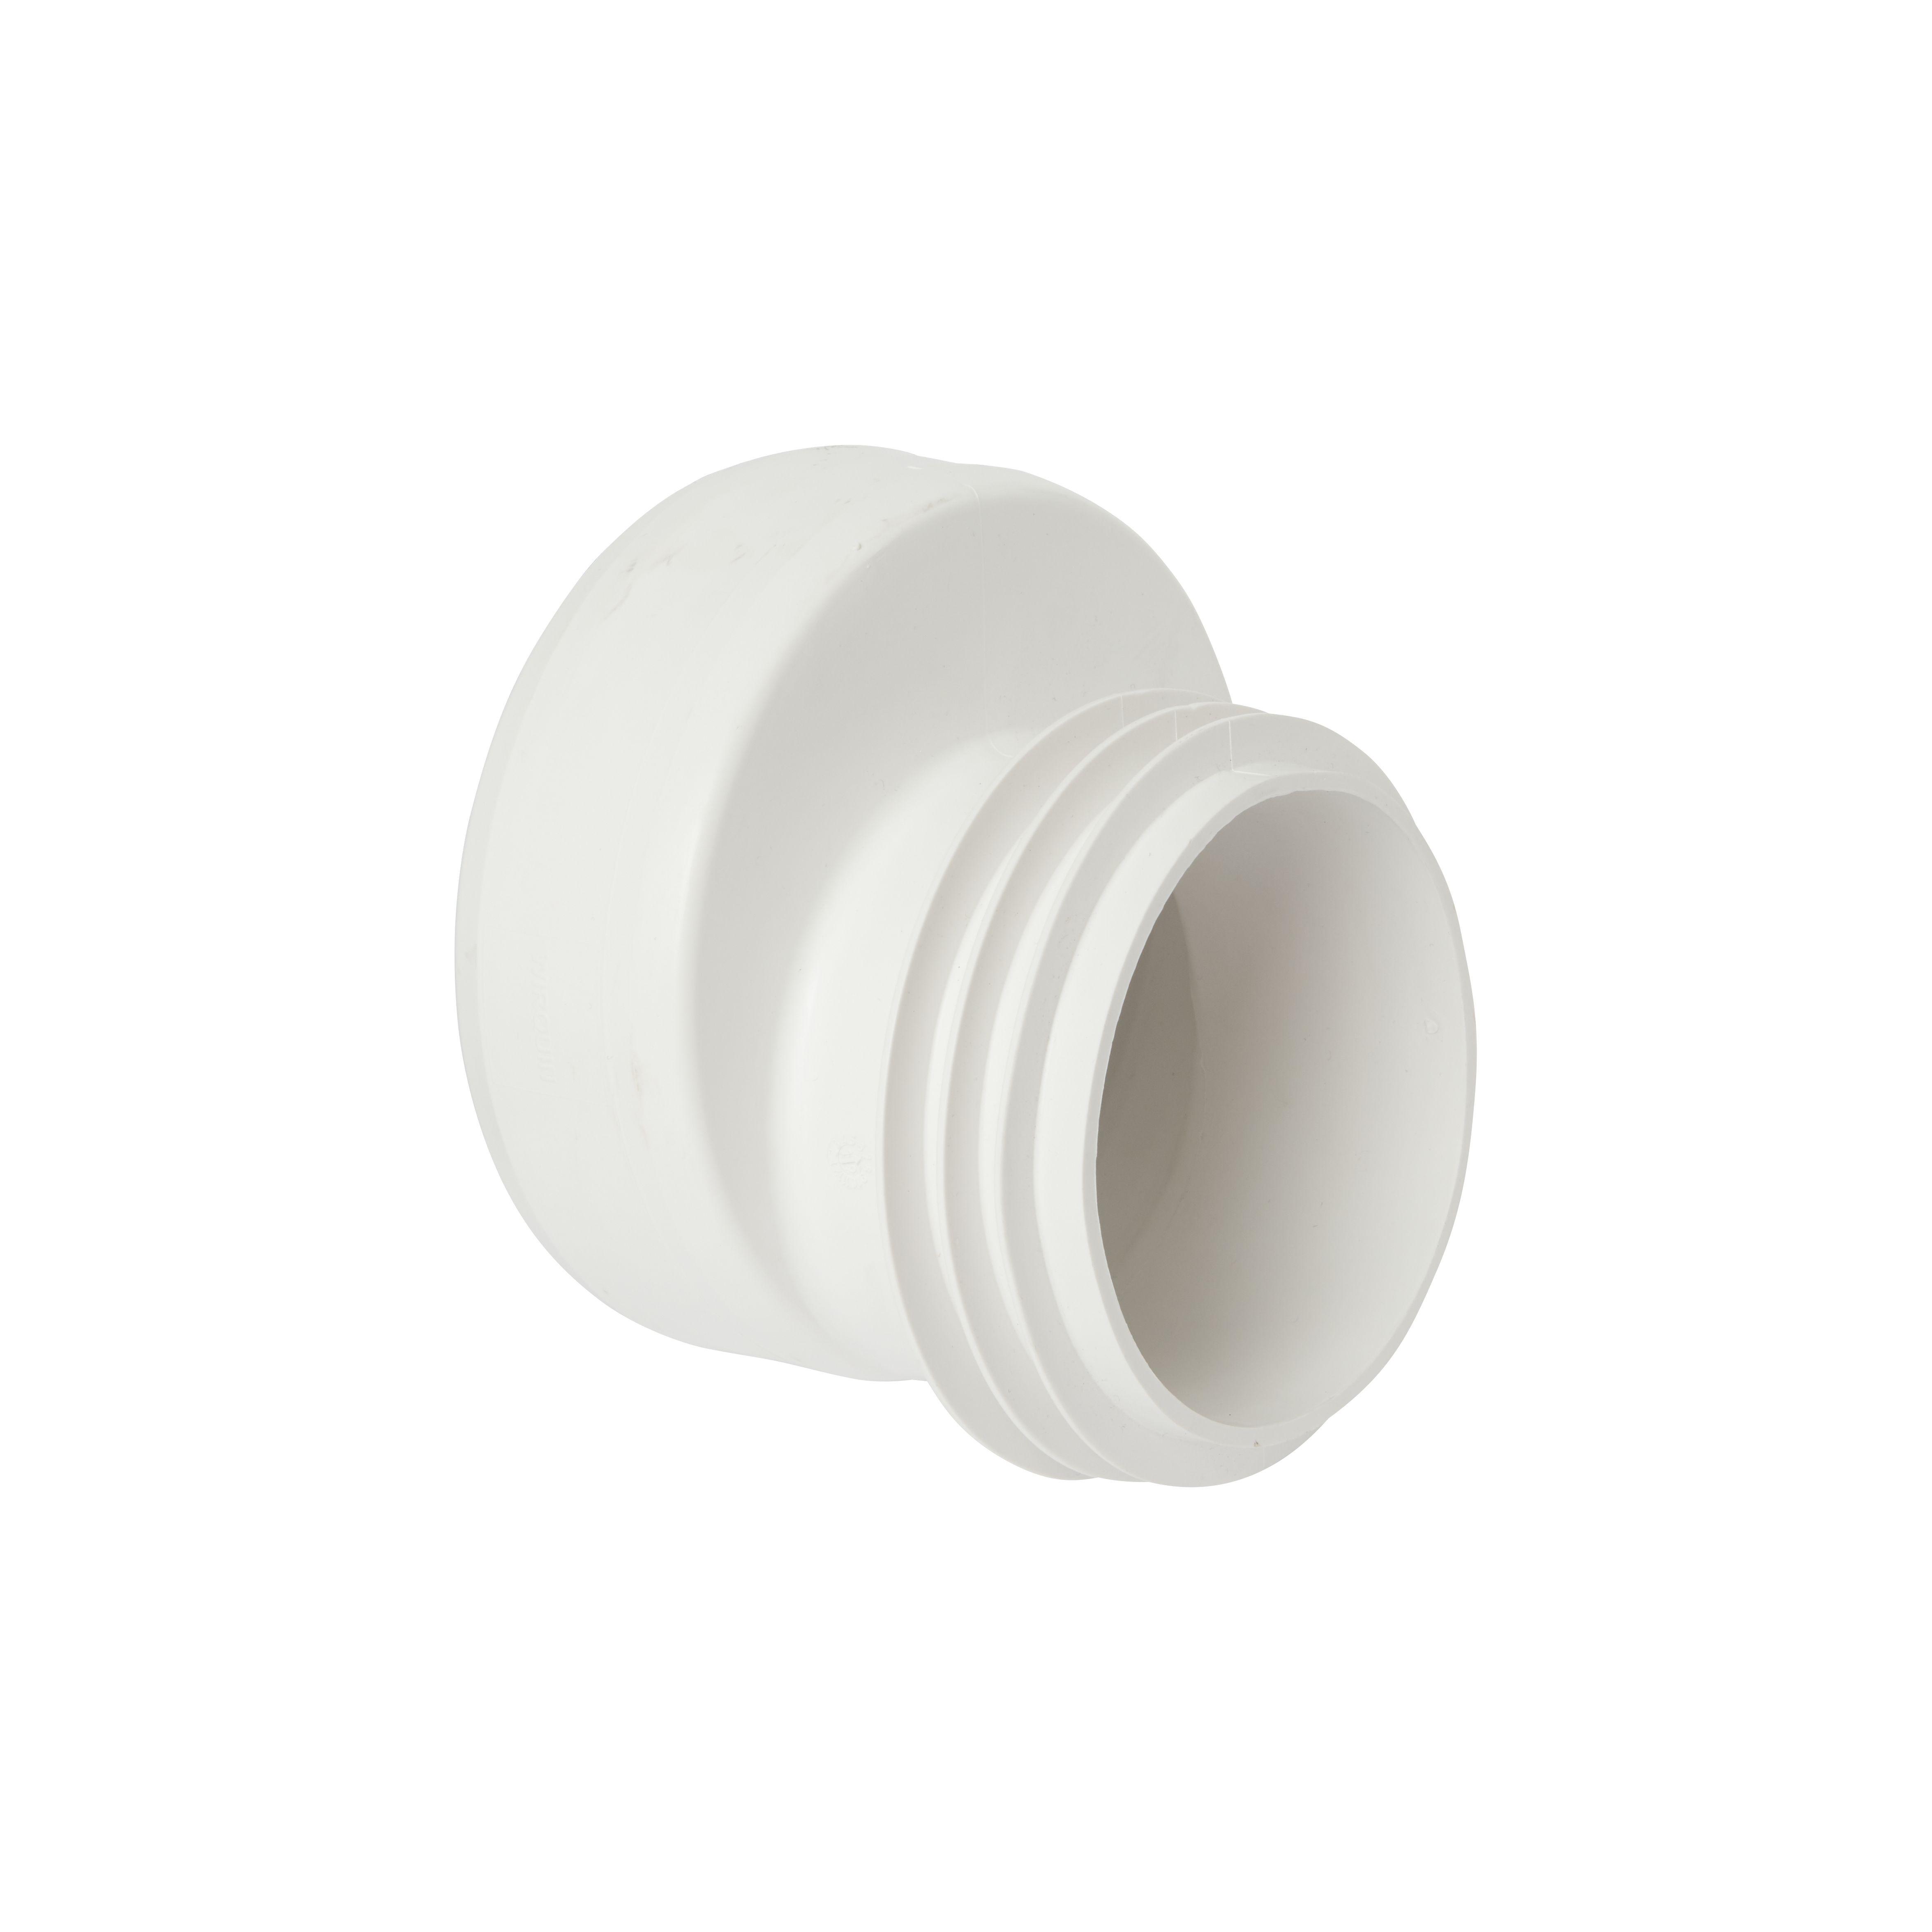 Wirquin push fit offset pan connector dia 110mm departments diy at b q - Changer un joint de wc ...